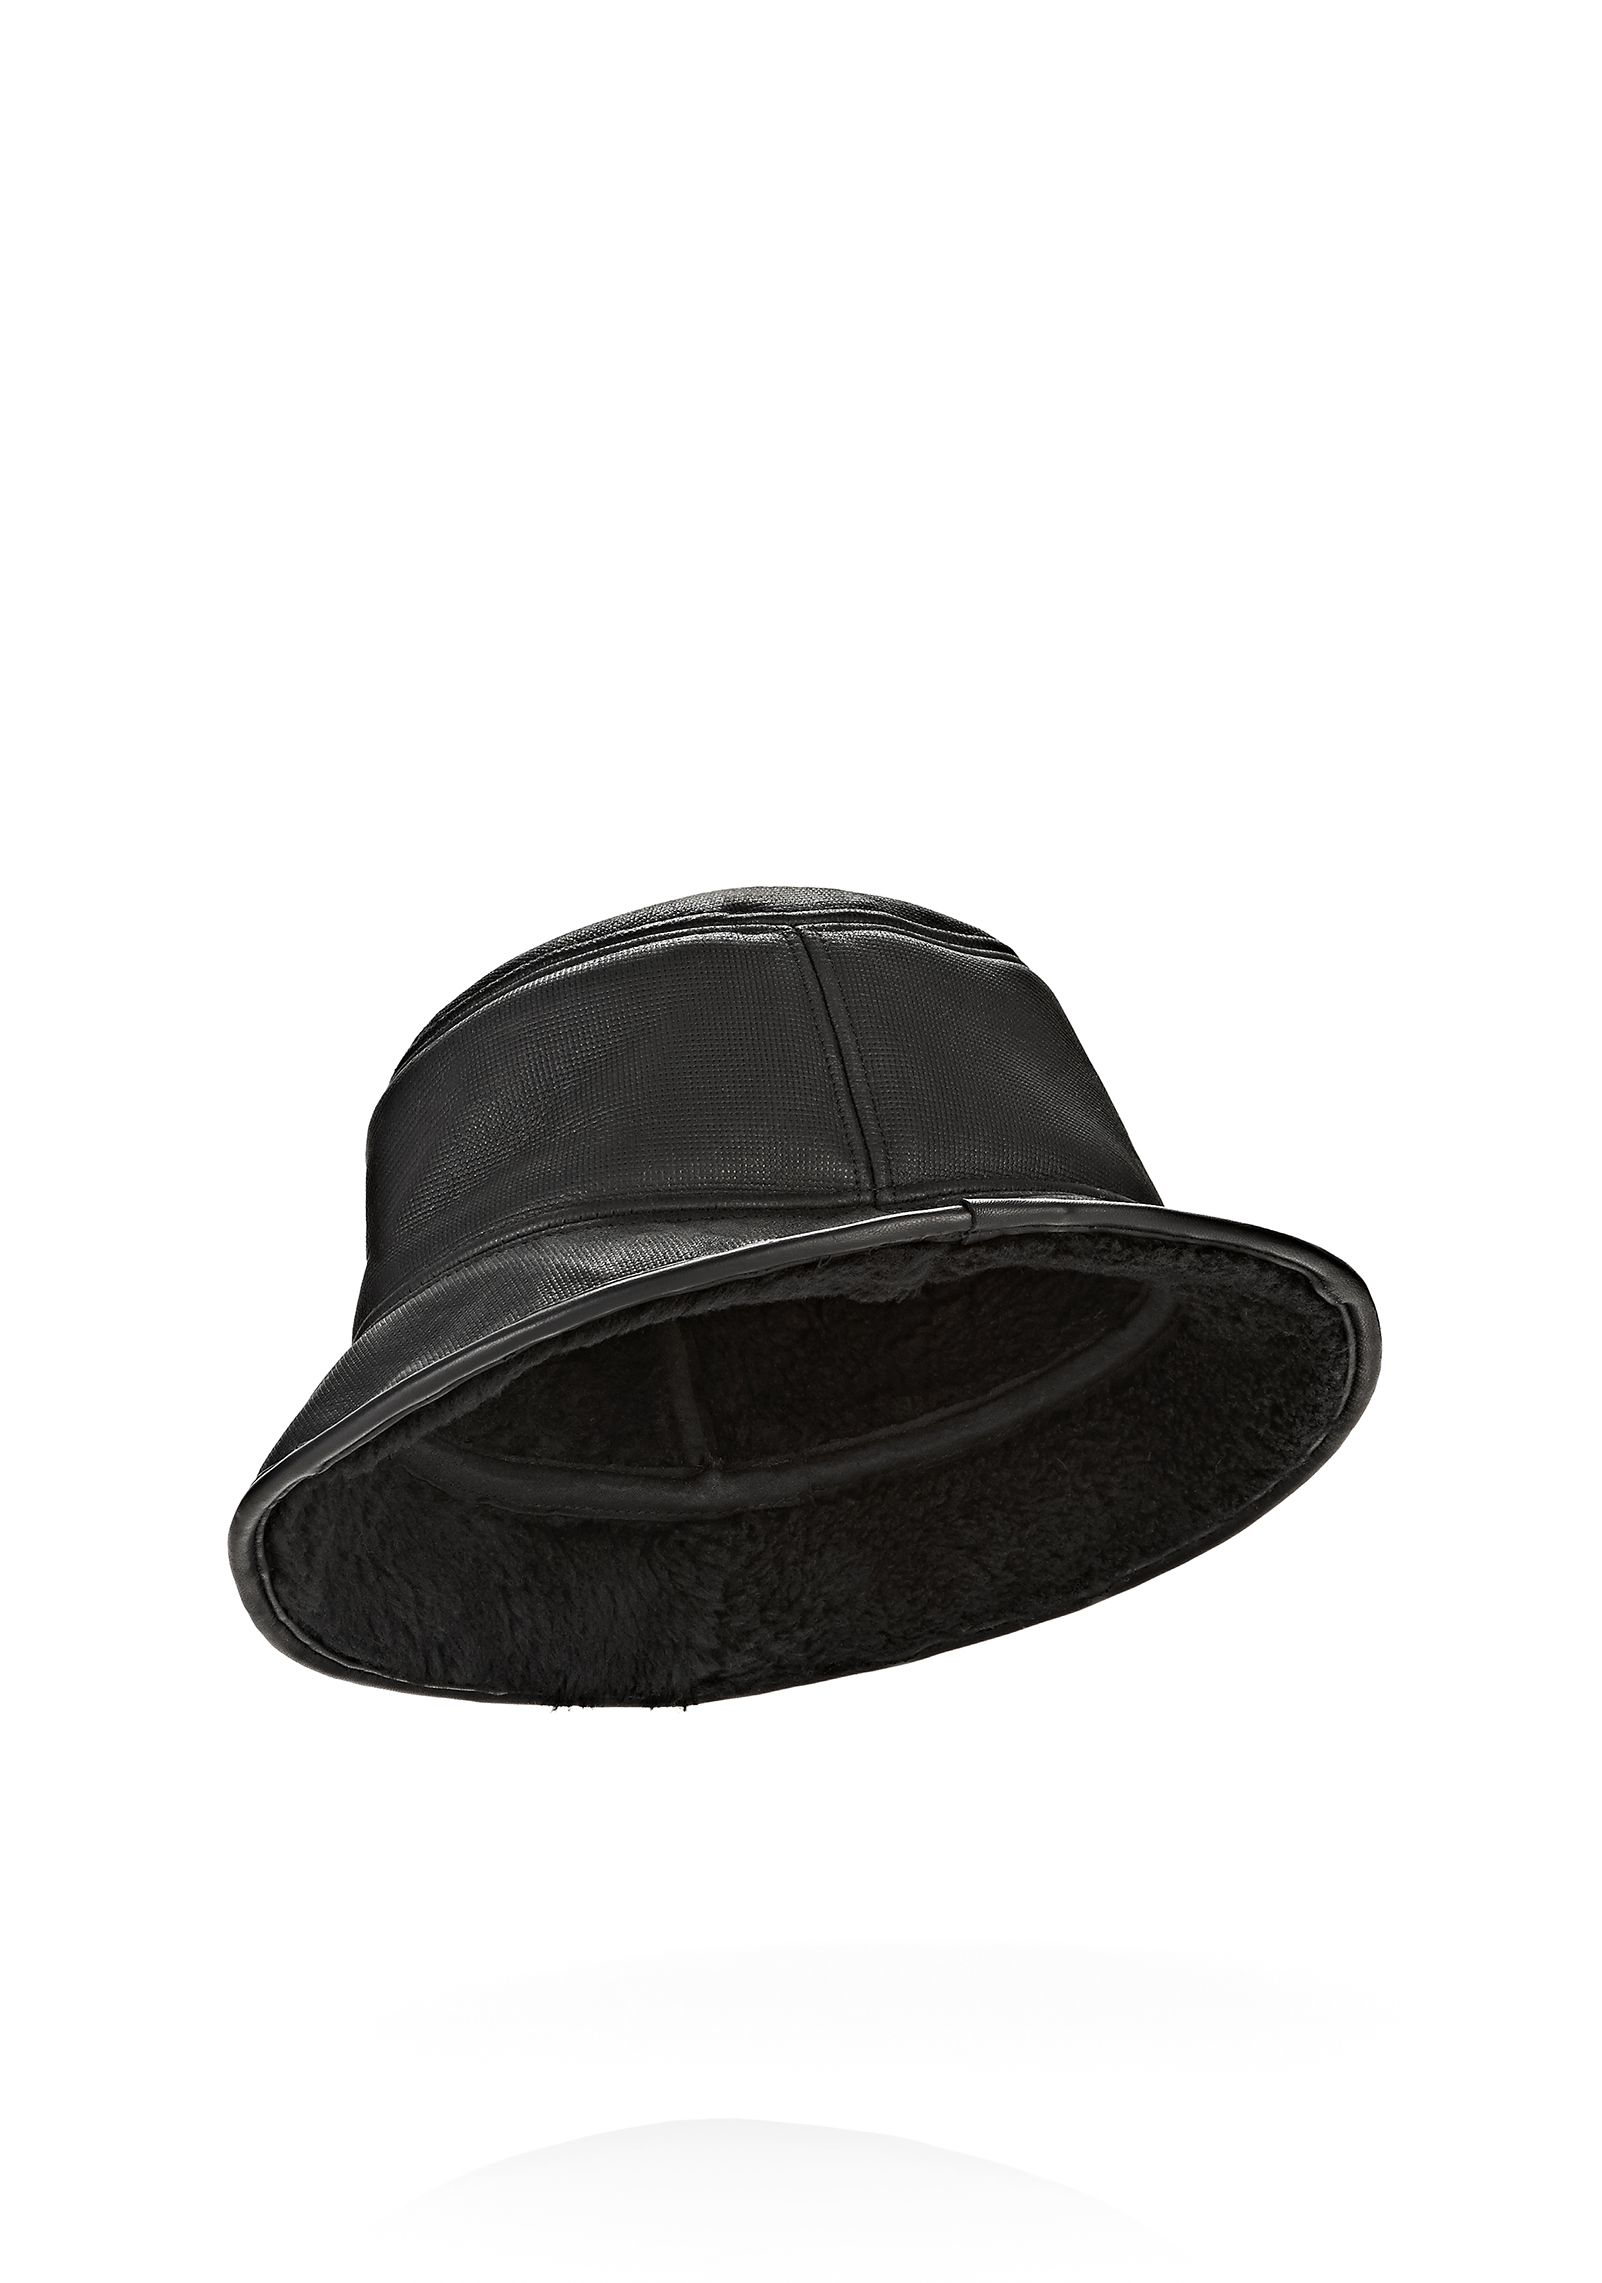 Lyst - Alexander Wang Shearling Bucket Hat in Black for Men 26ee7a56a57